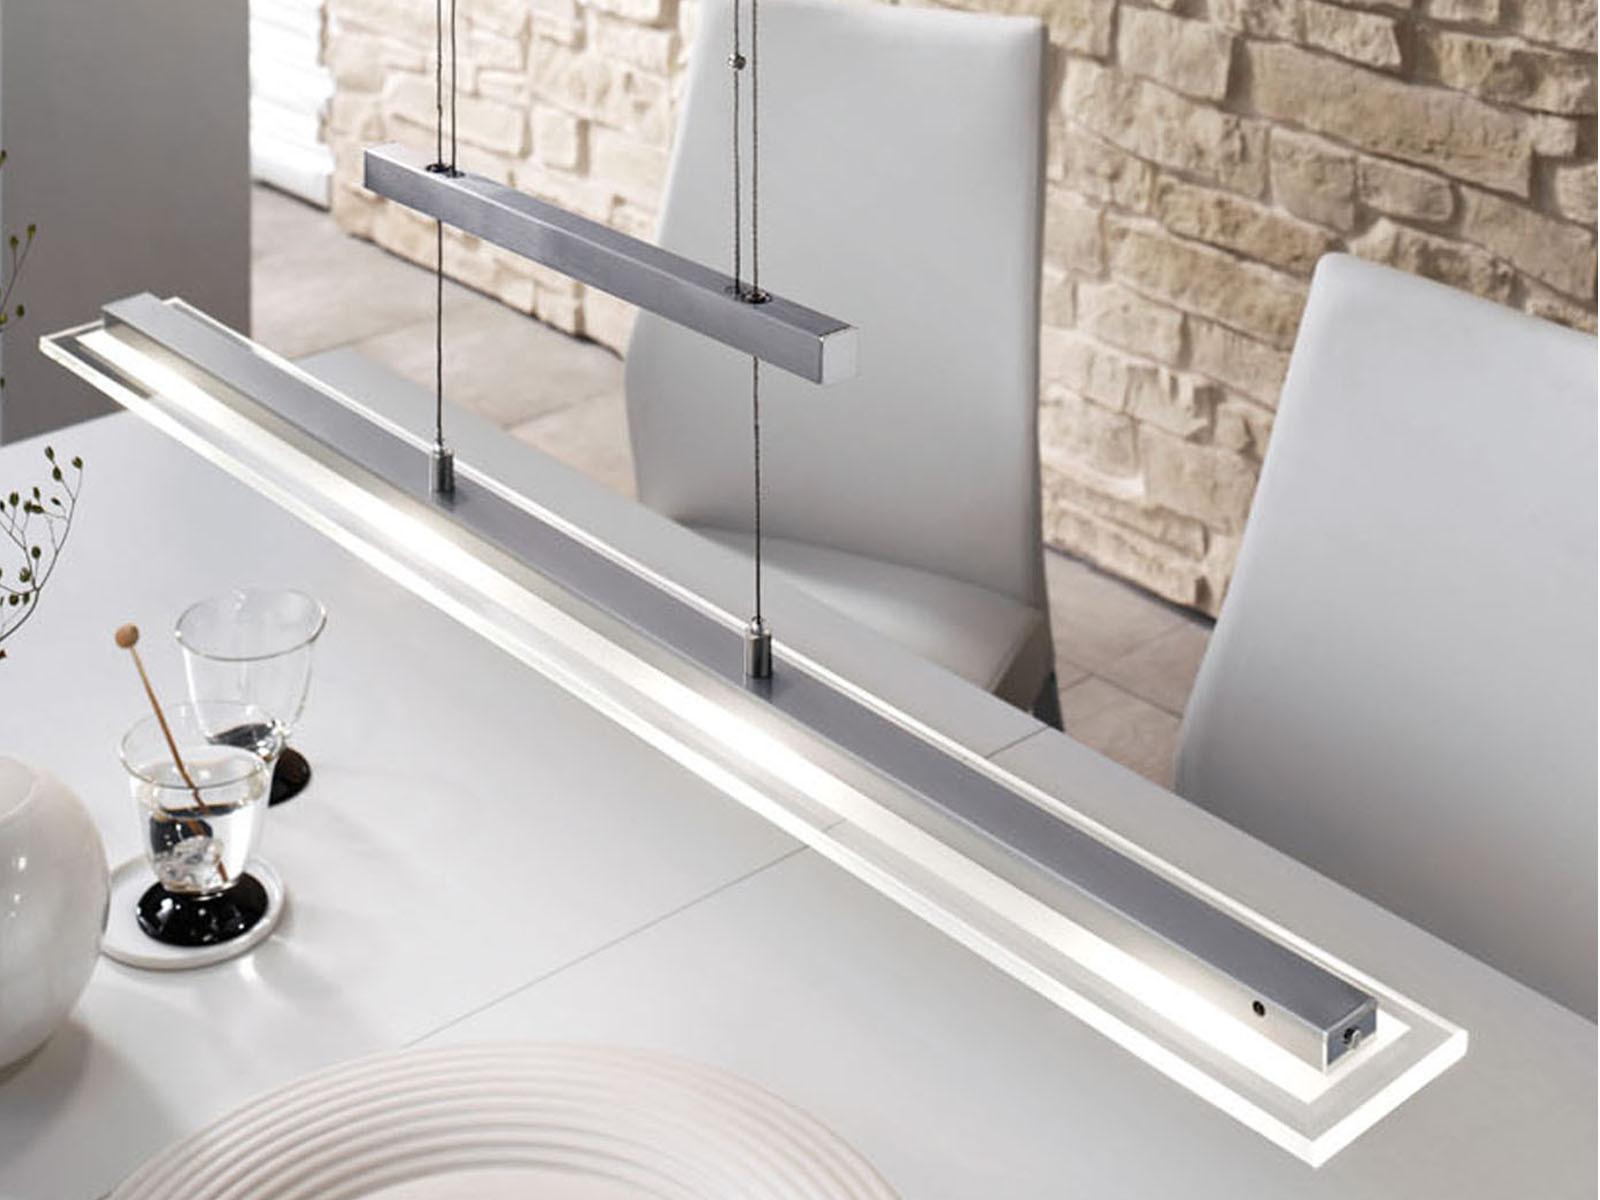 led pendelleuchte dimmbar und h henverstellbar mit. Black Bedroom Furniture Sets. Home Design Ideas